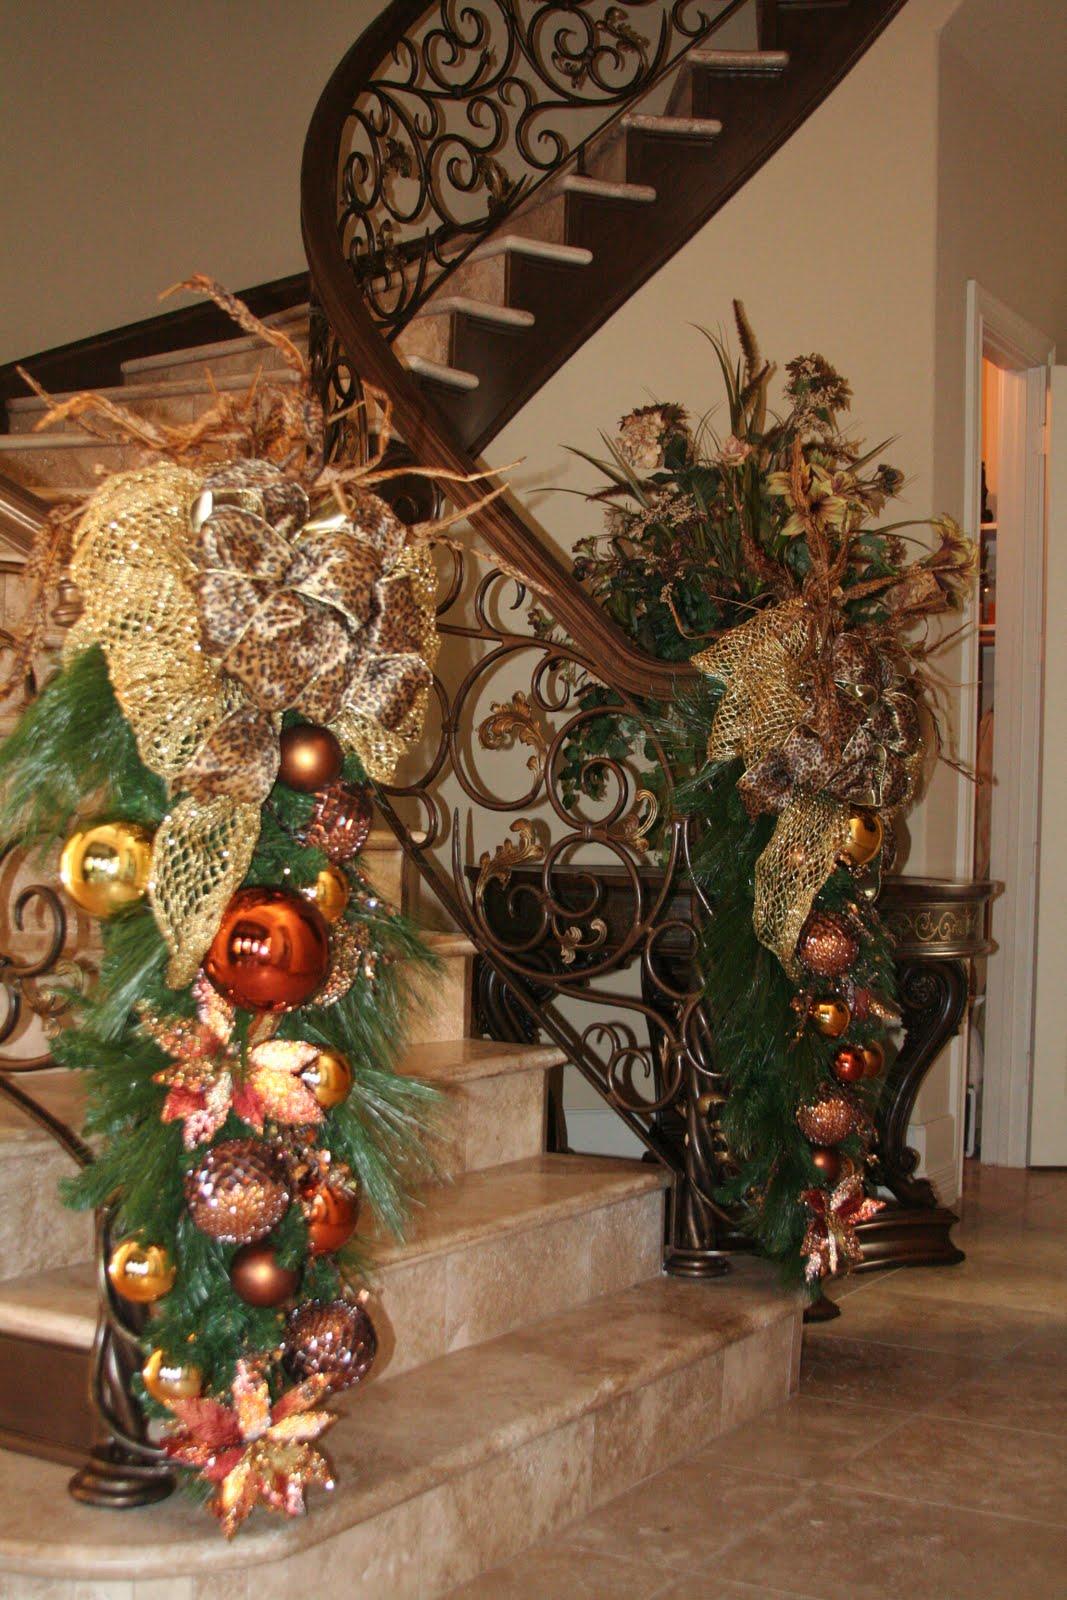 Christmas Staircase Decor on Pinterest